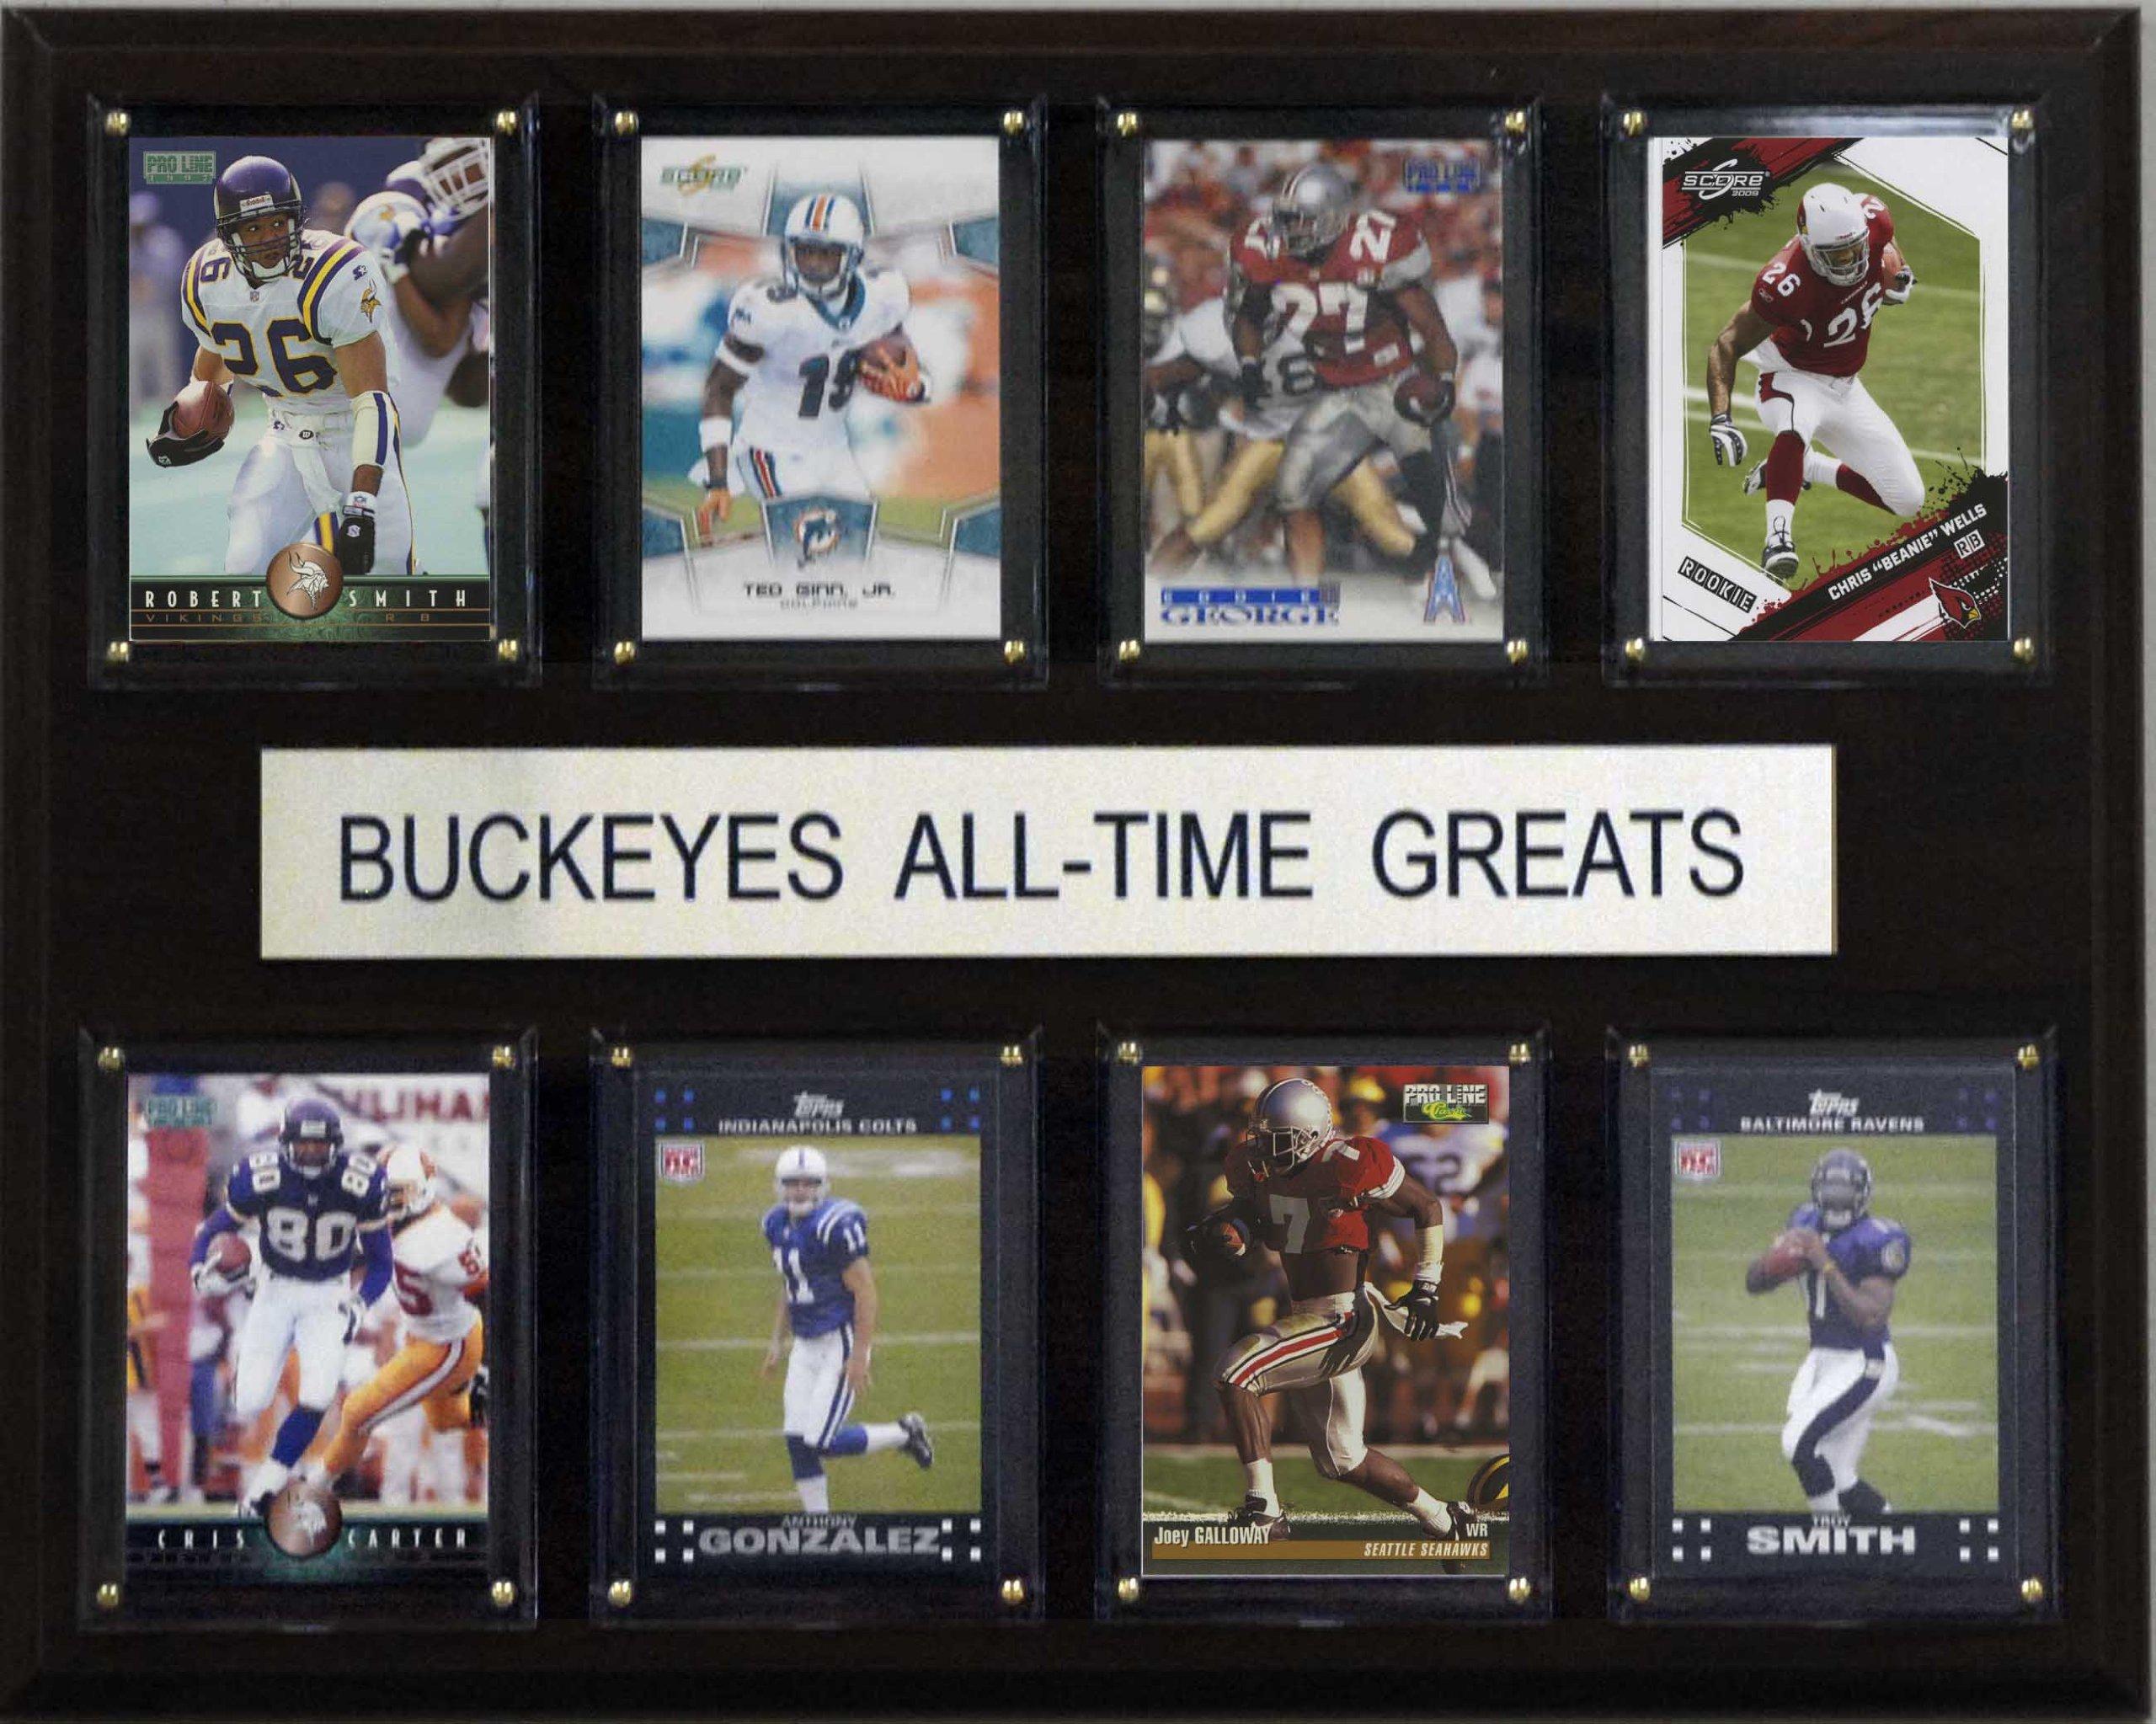 NCAA Football Ohio State Buckeyes All-Time Greats Plaque